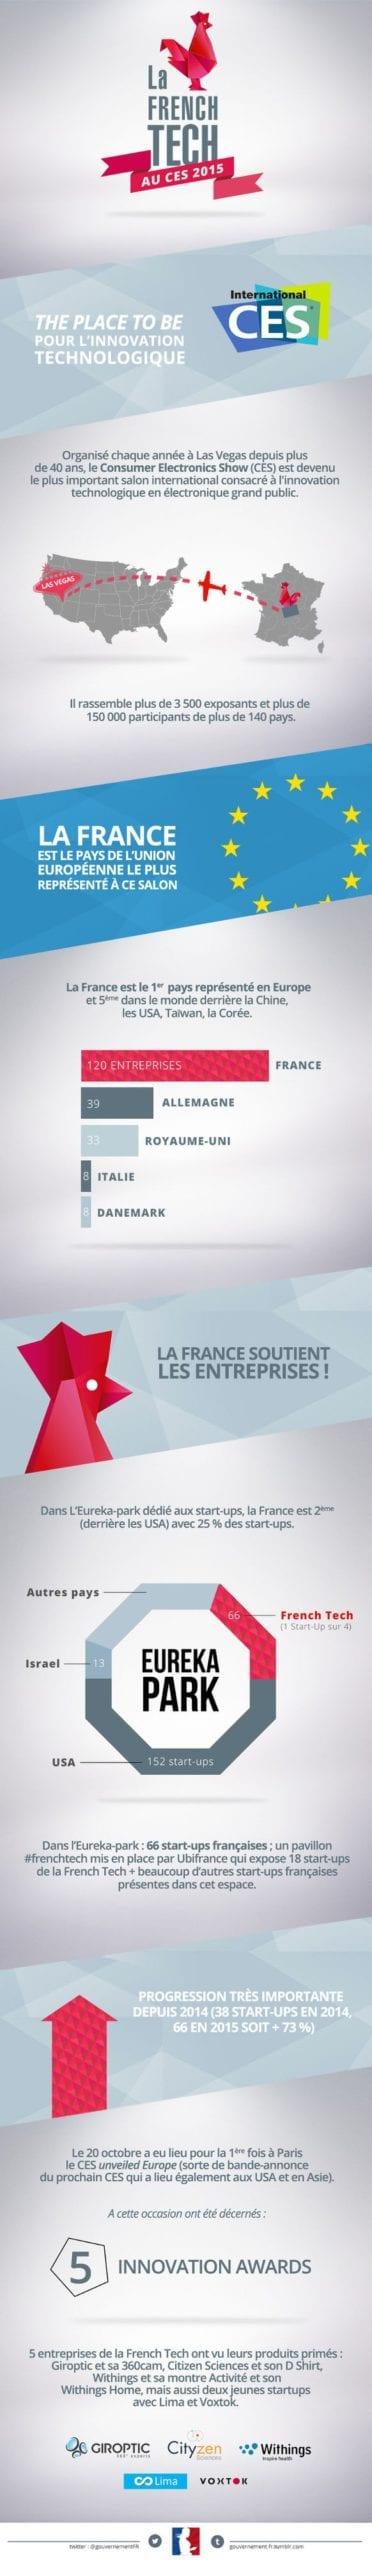 infographie CES show